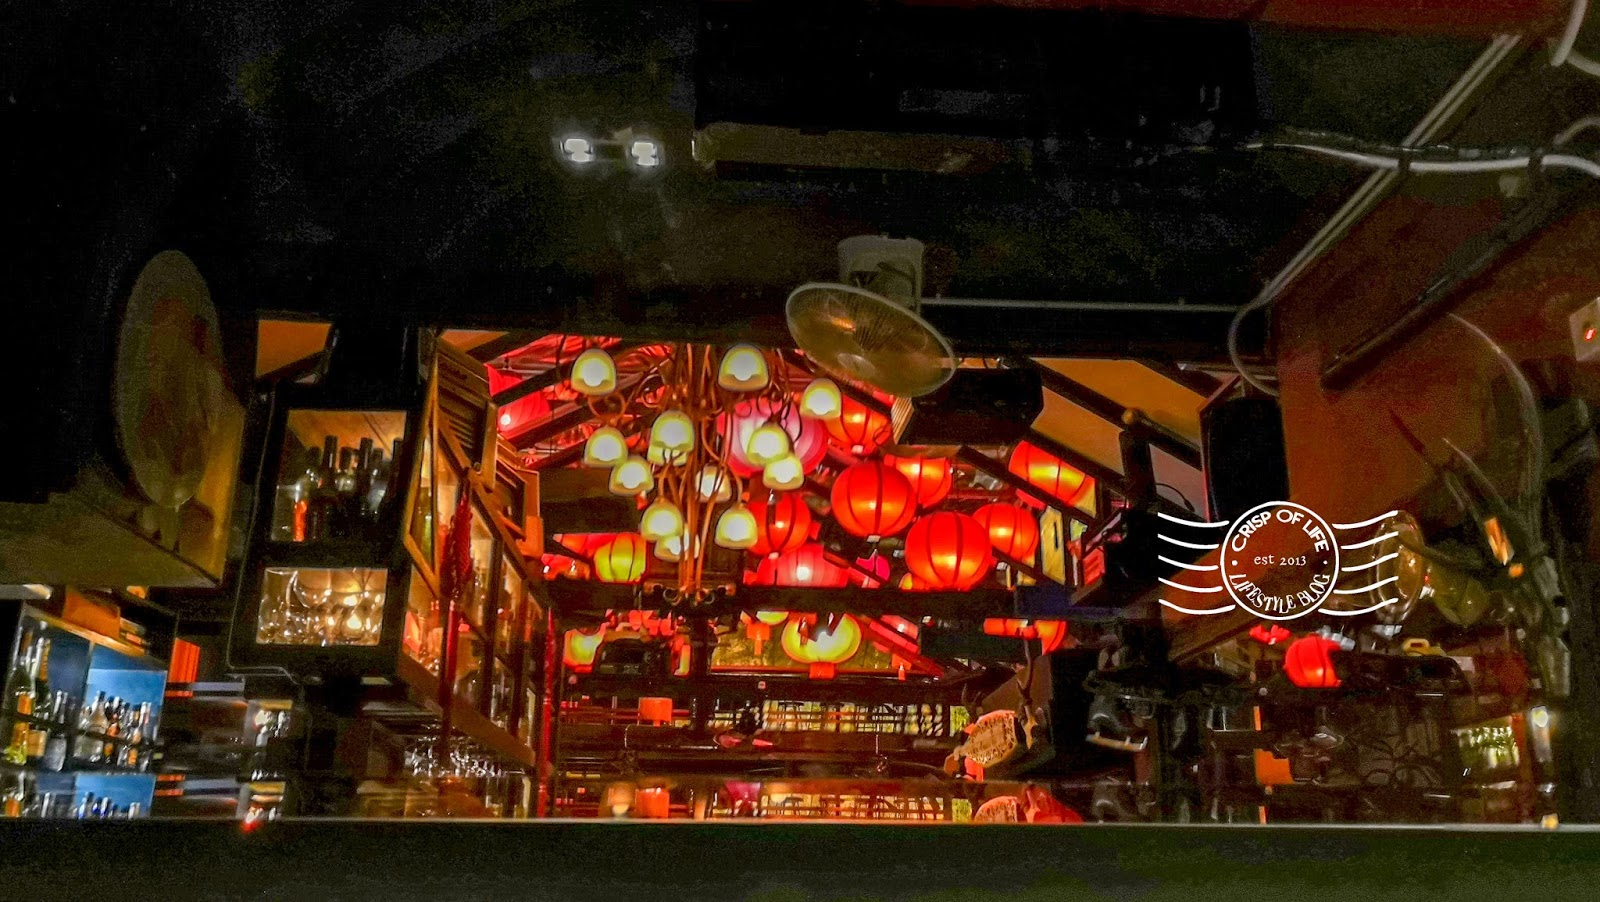 The Junk Cafe @ Wayang Street, Kuching, Sarawak